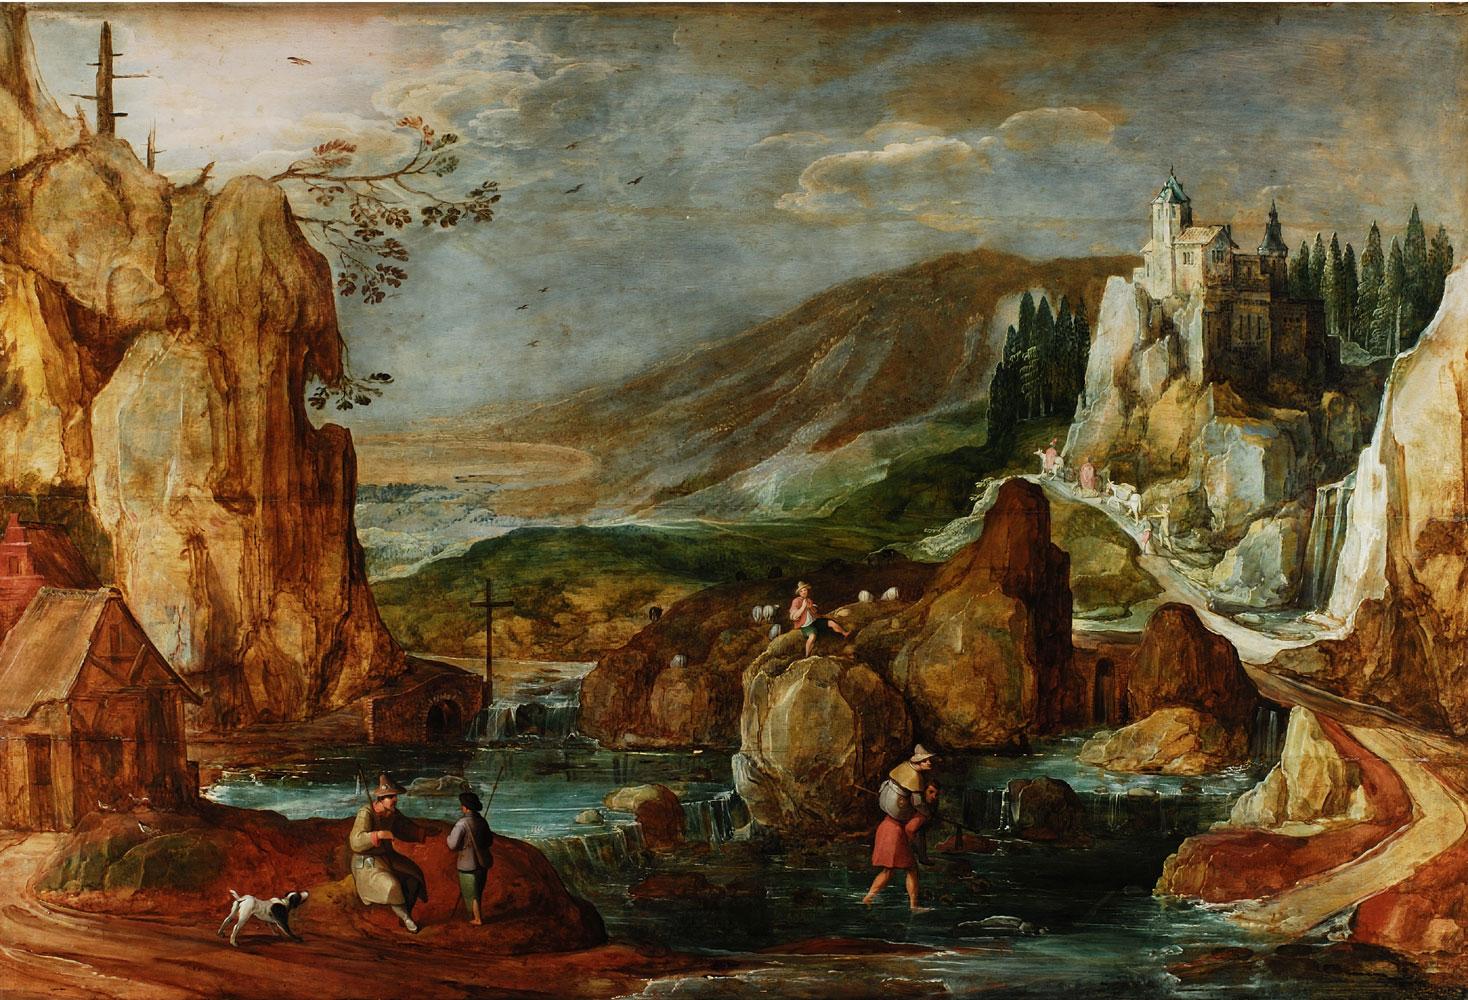 Josse de Momper 1564 – 1635